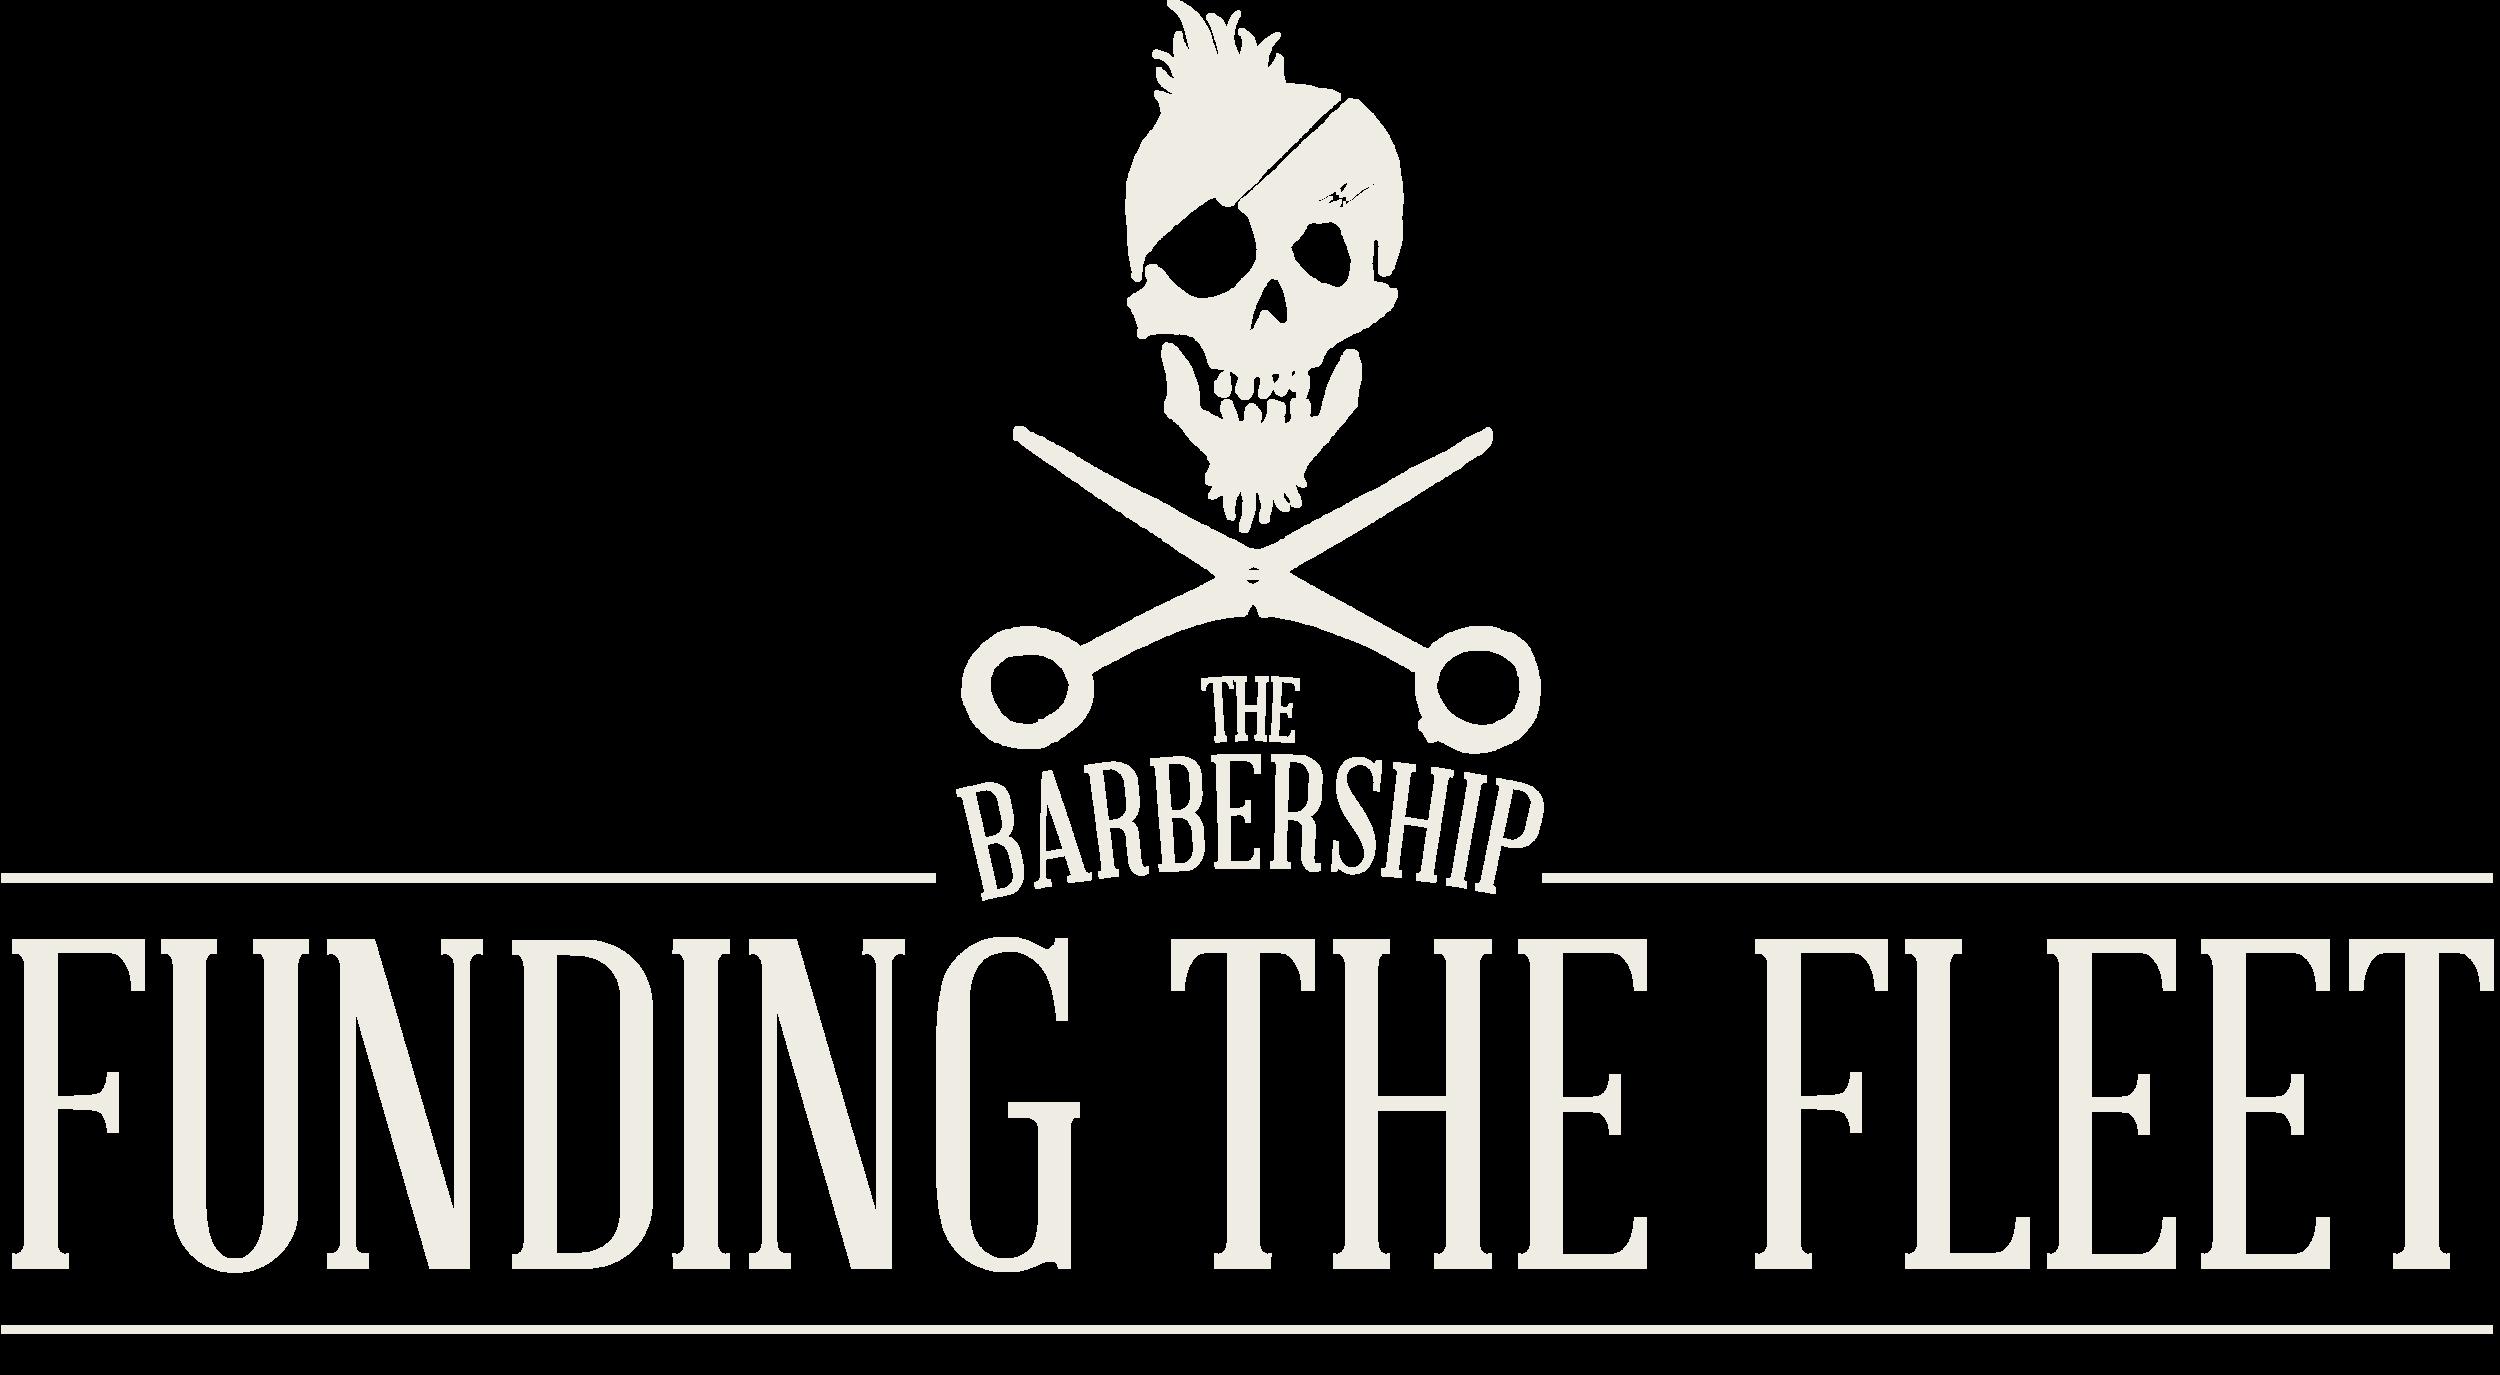 Funding the Fleet Barbership Website Banner.png